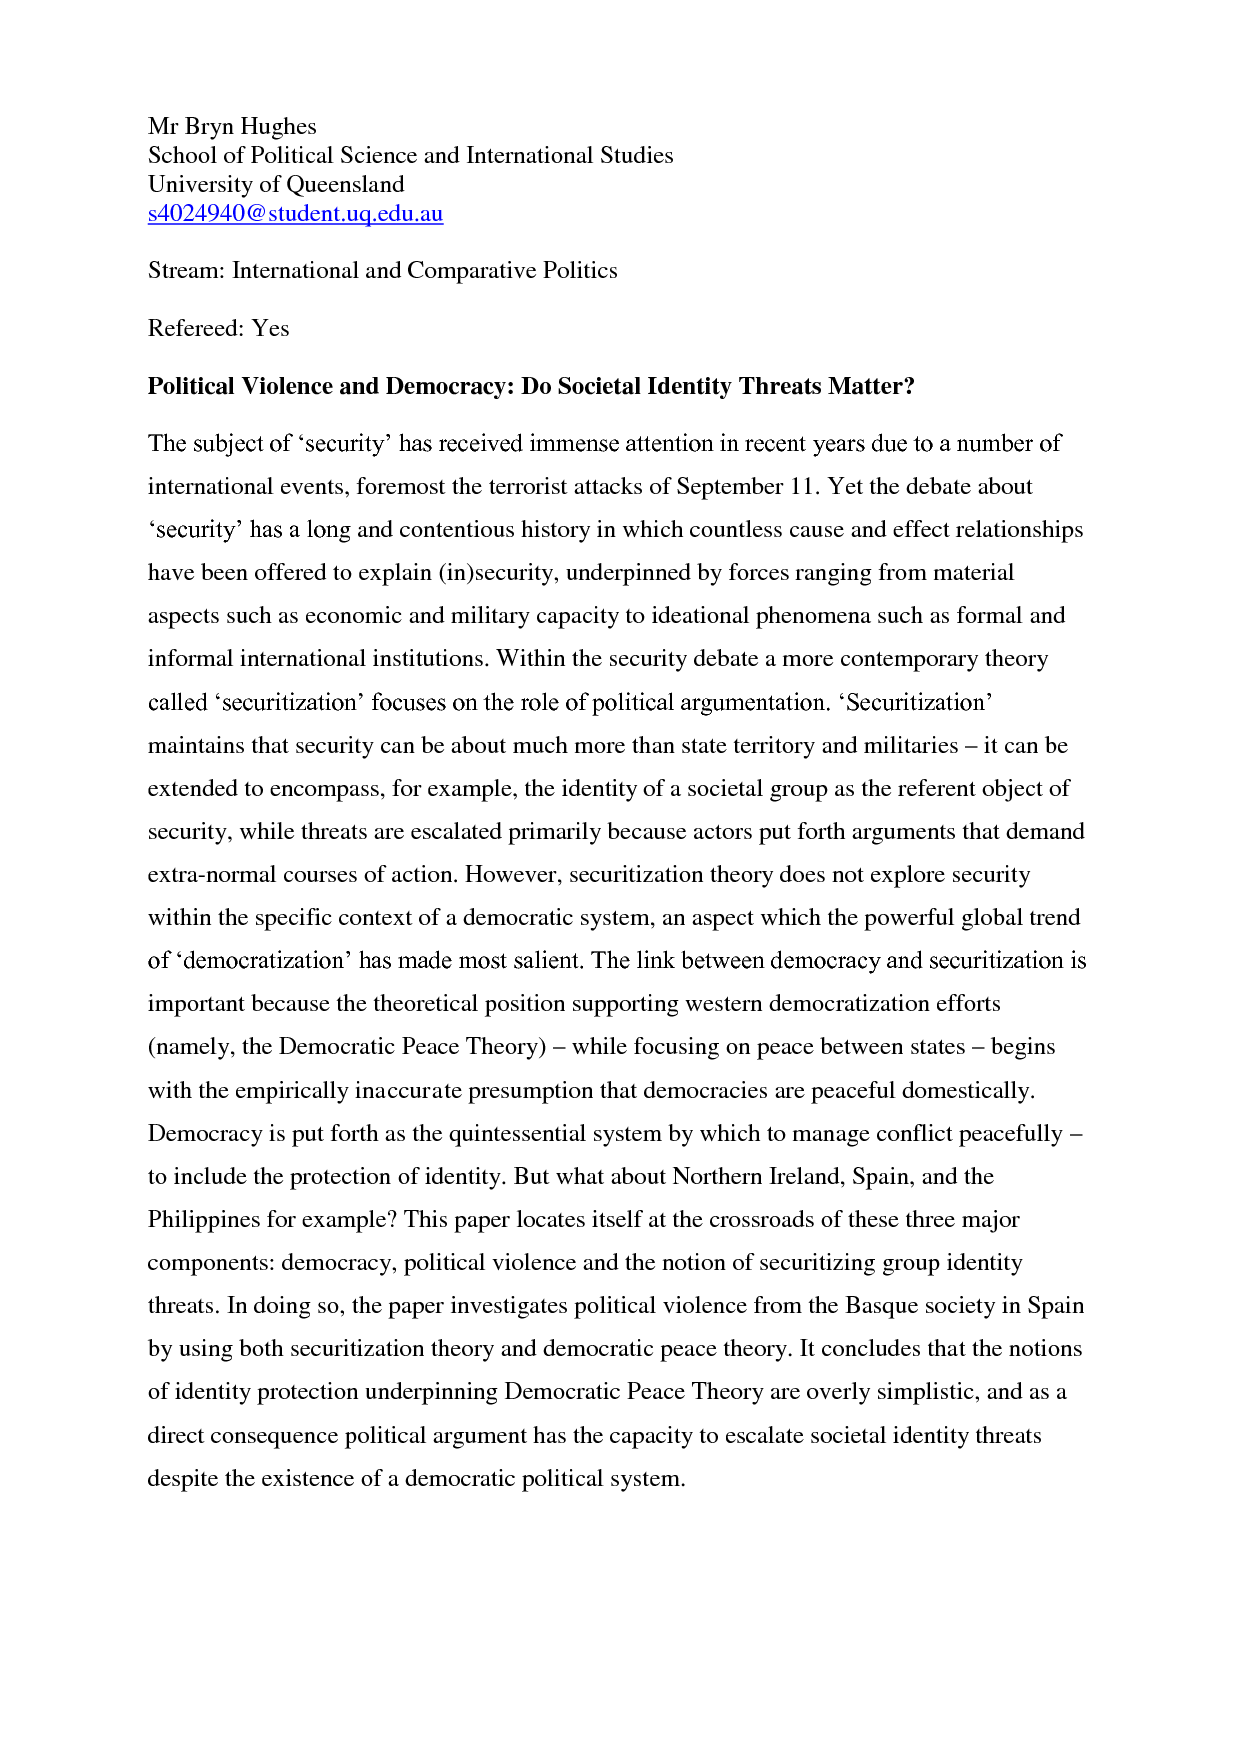 apsa format example paper